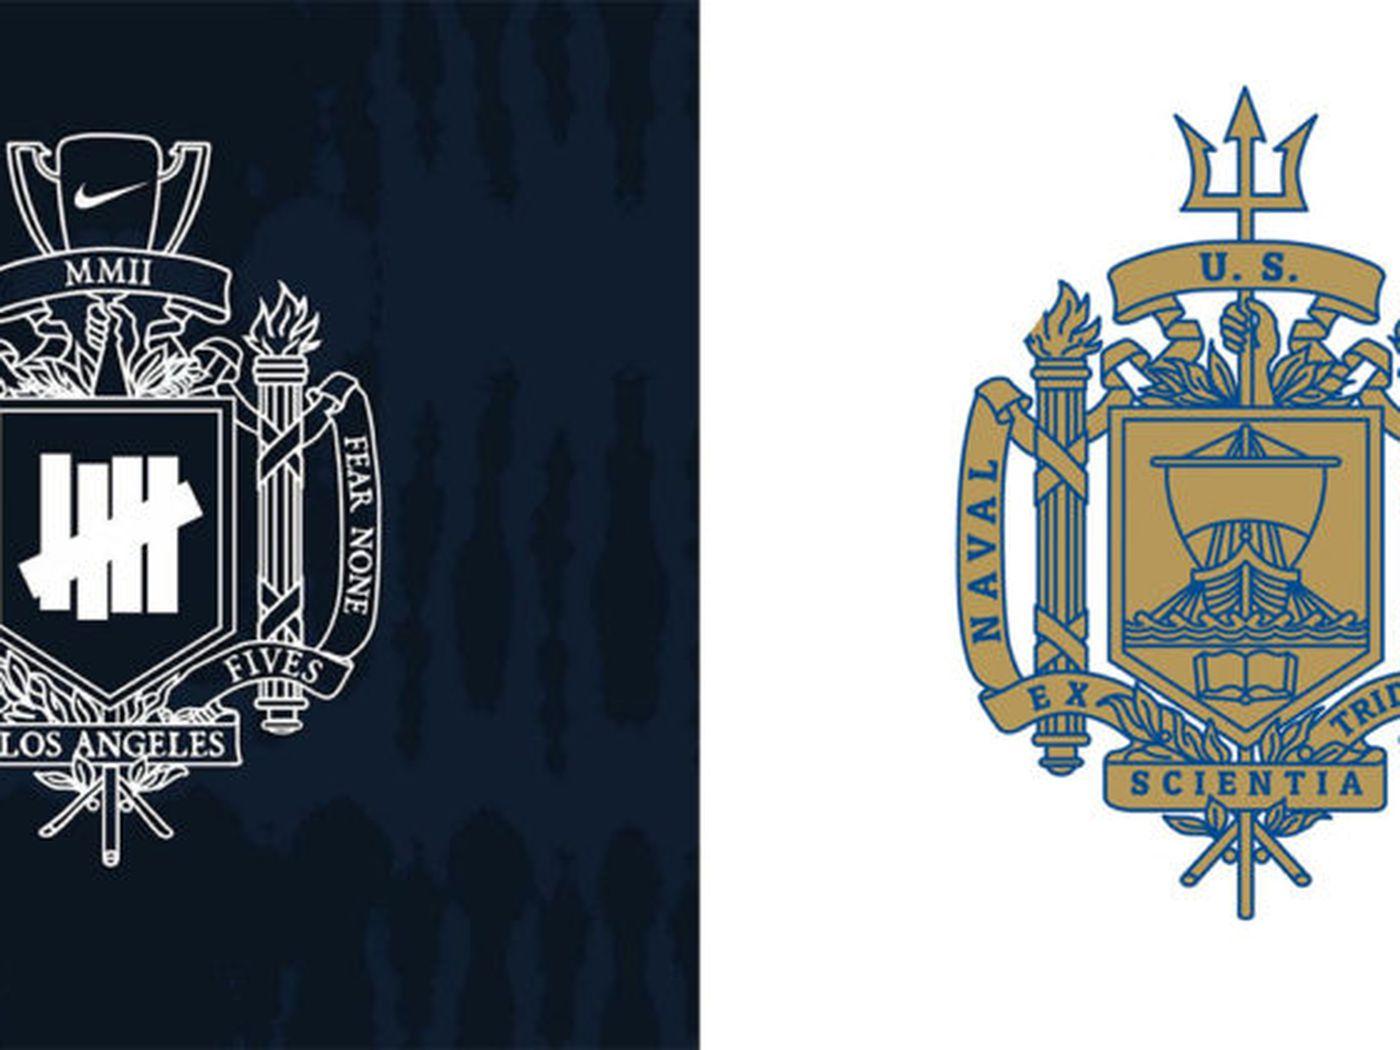 Navy accuses Nike of trademark infringement over new crest logo -  SBNation.com 002841fef36